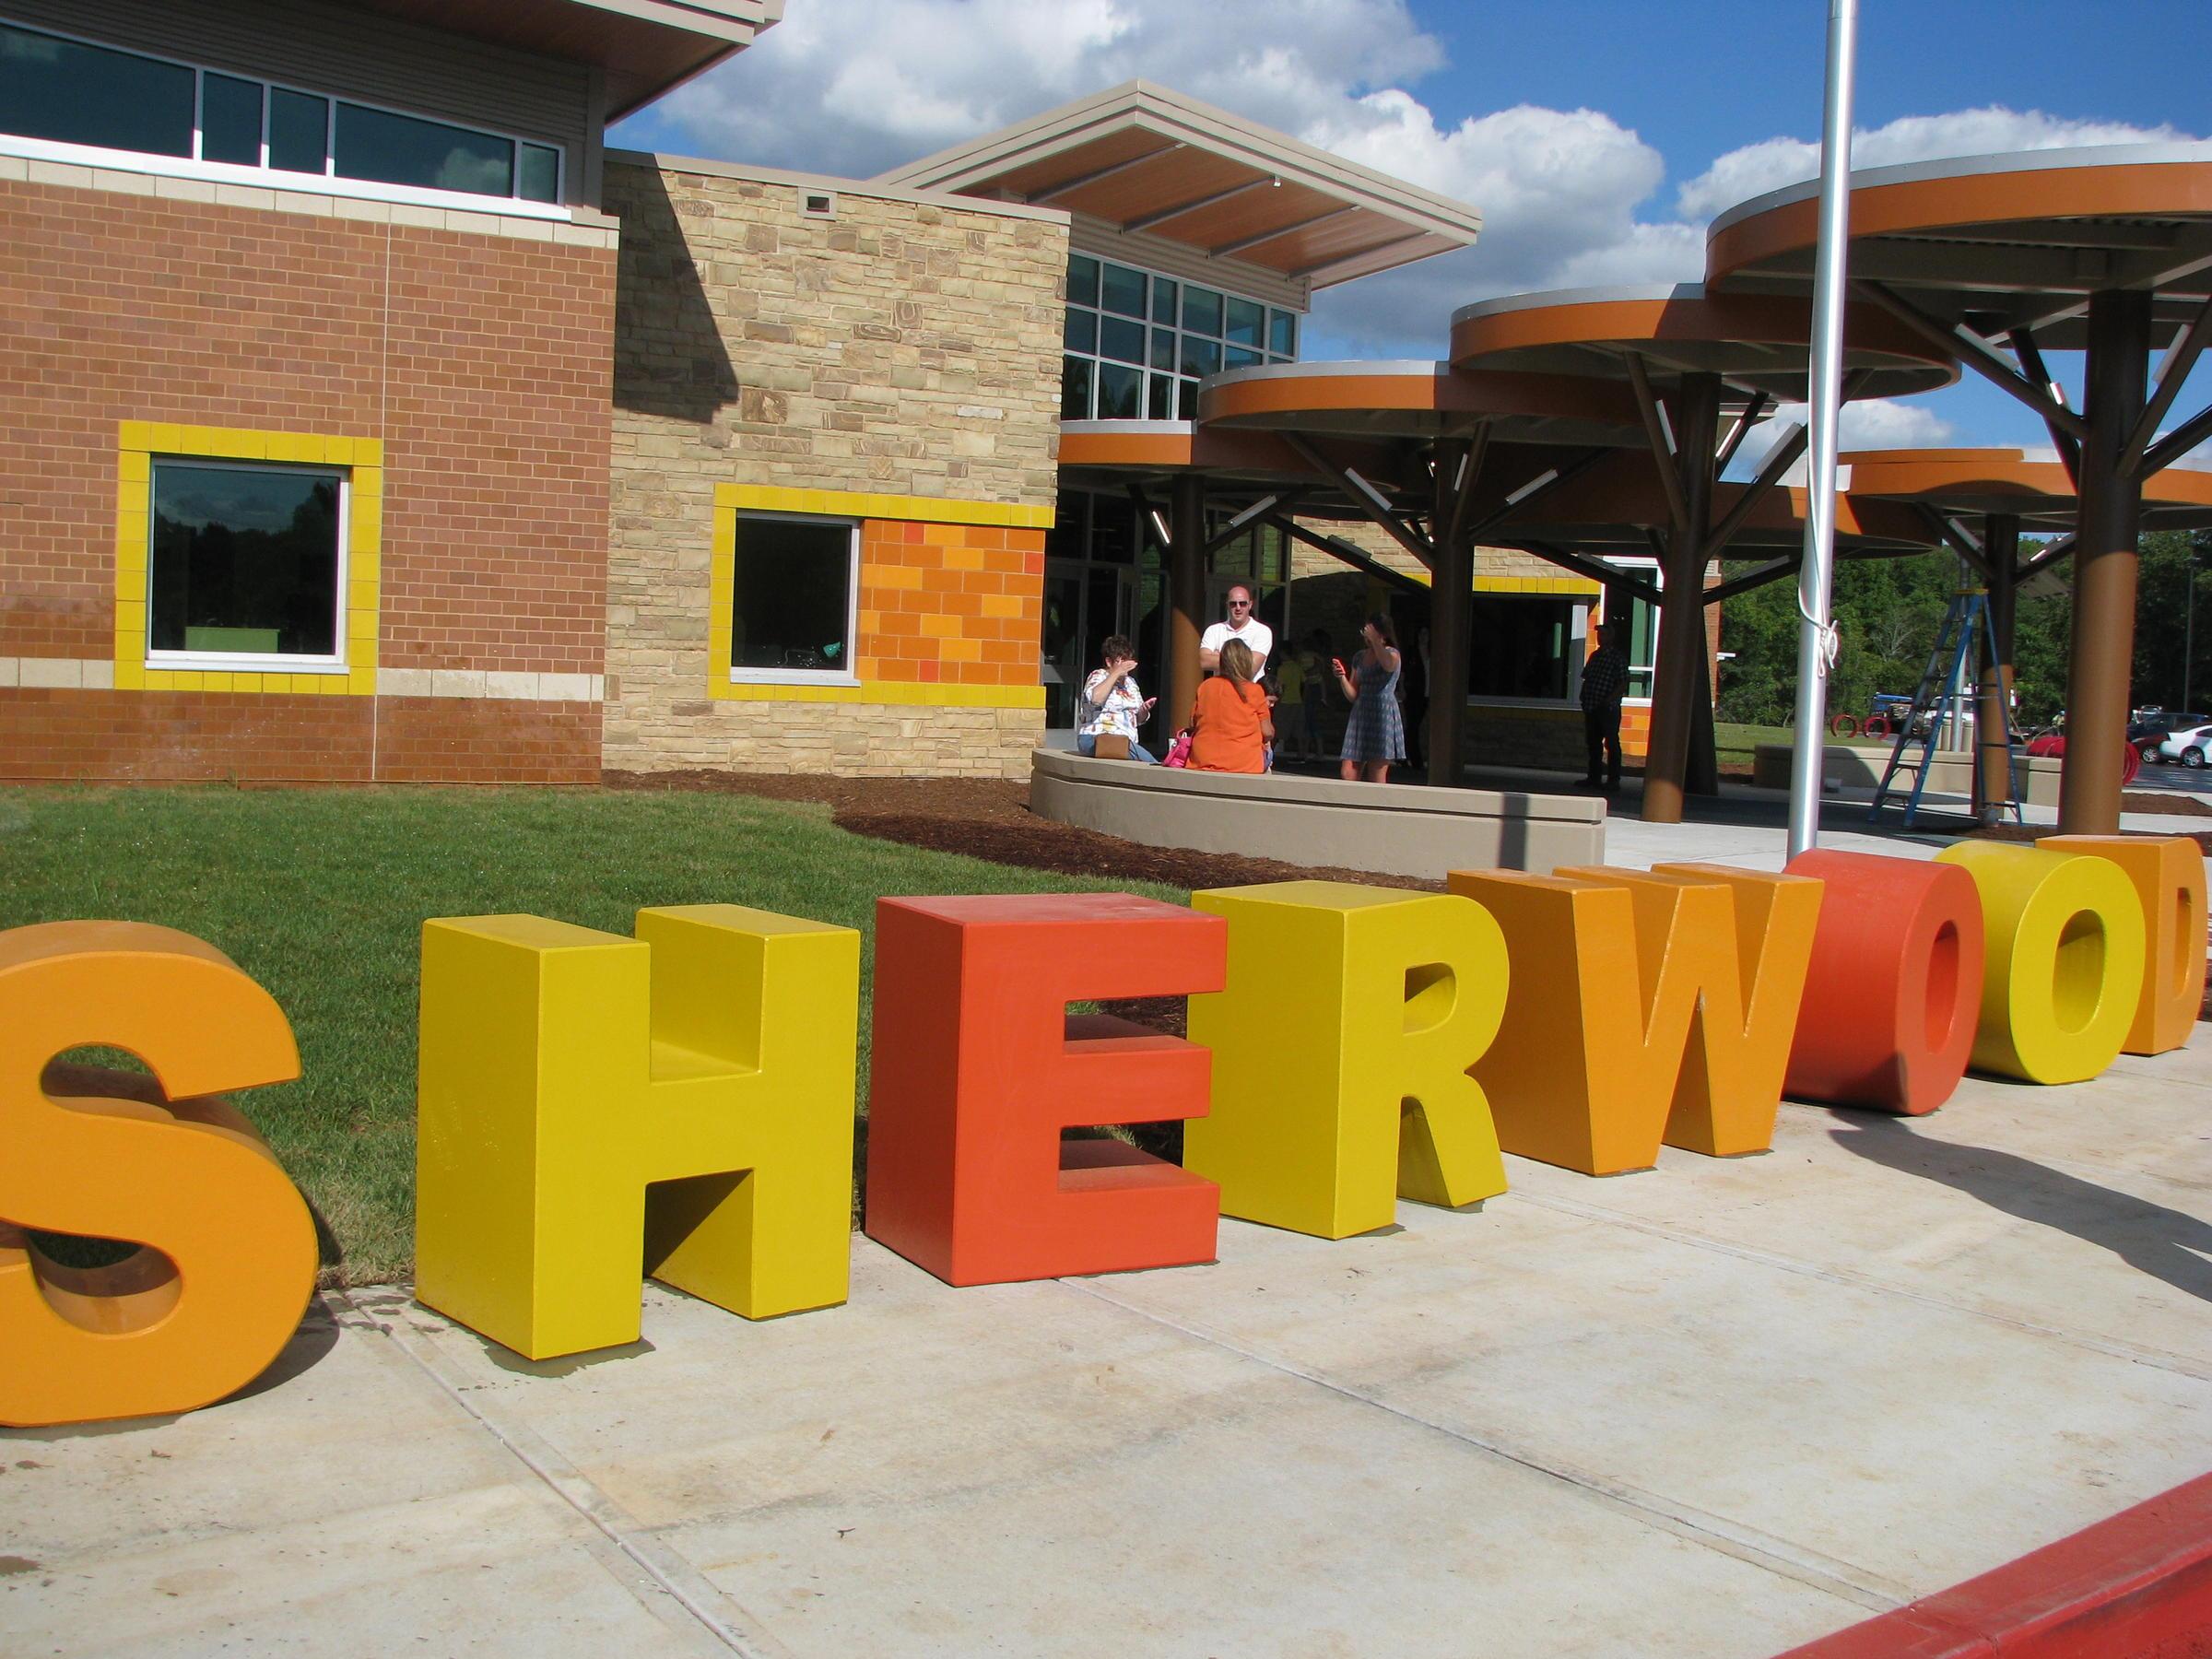 New School Year Begins in the Springfield School District